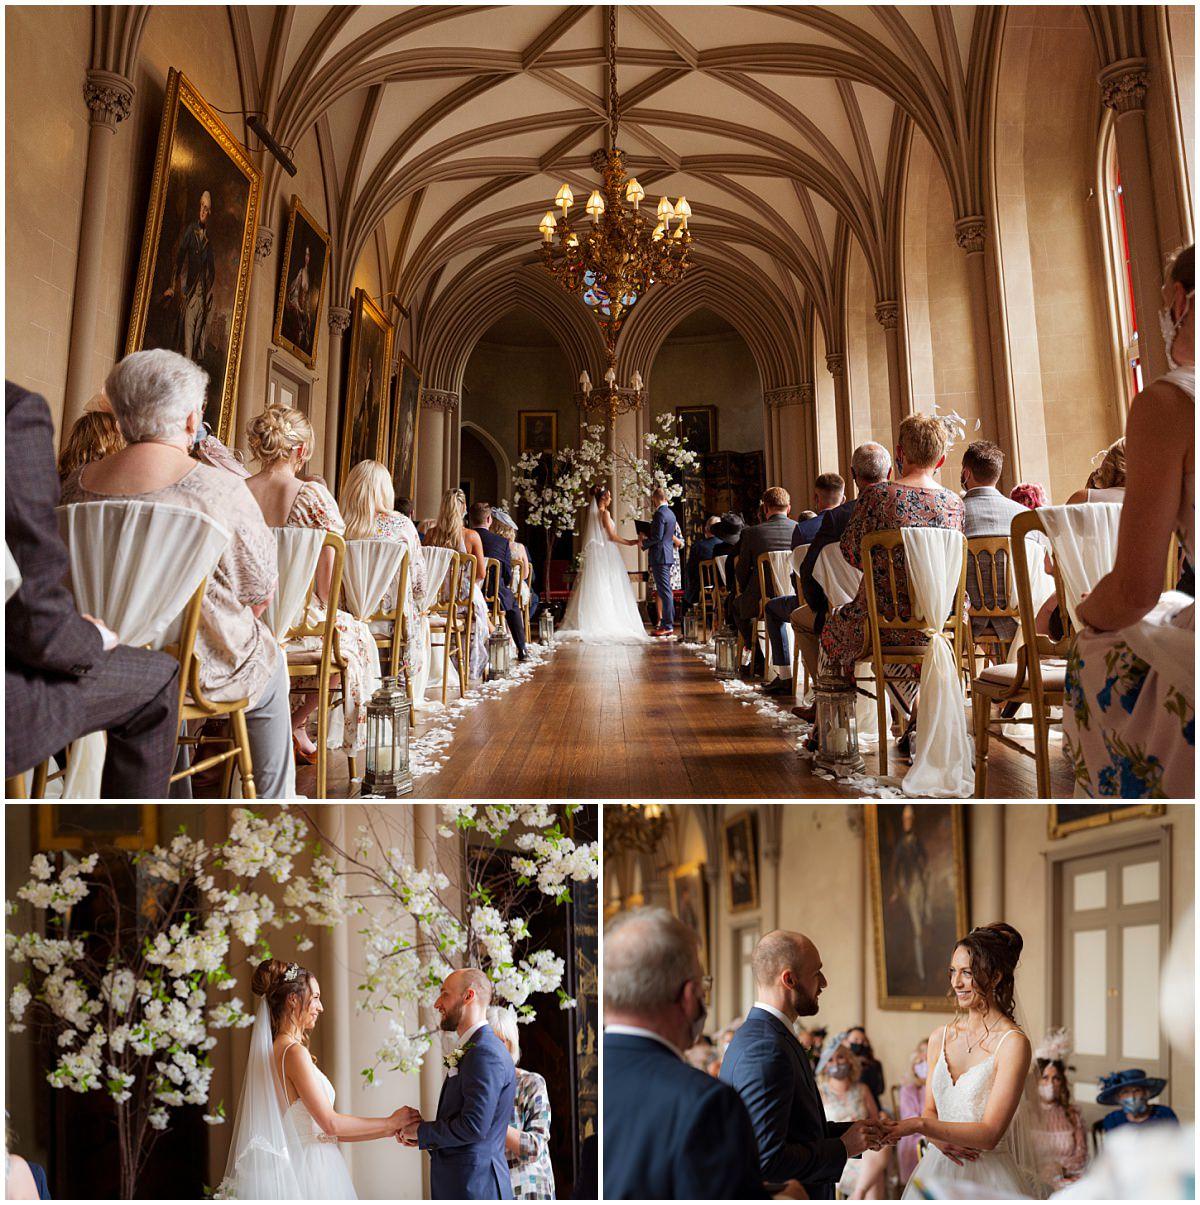 Belvoir Castle Wedding ceremony room